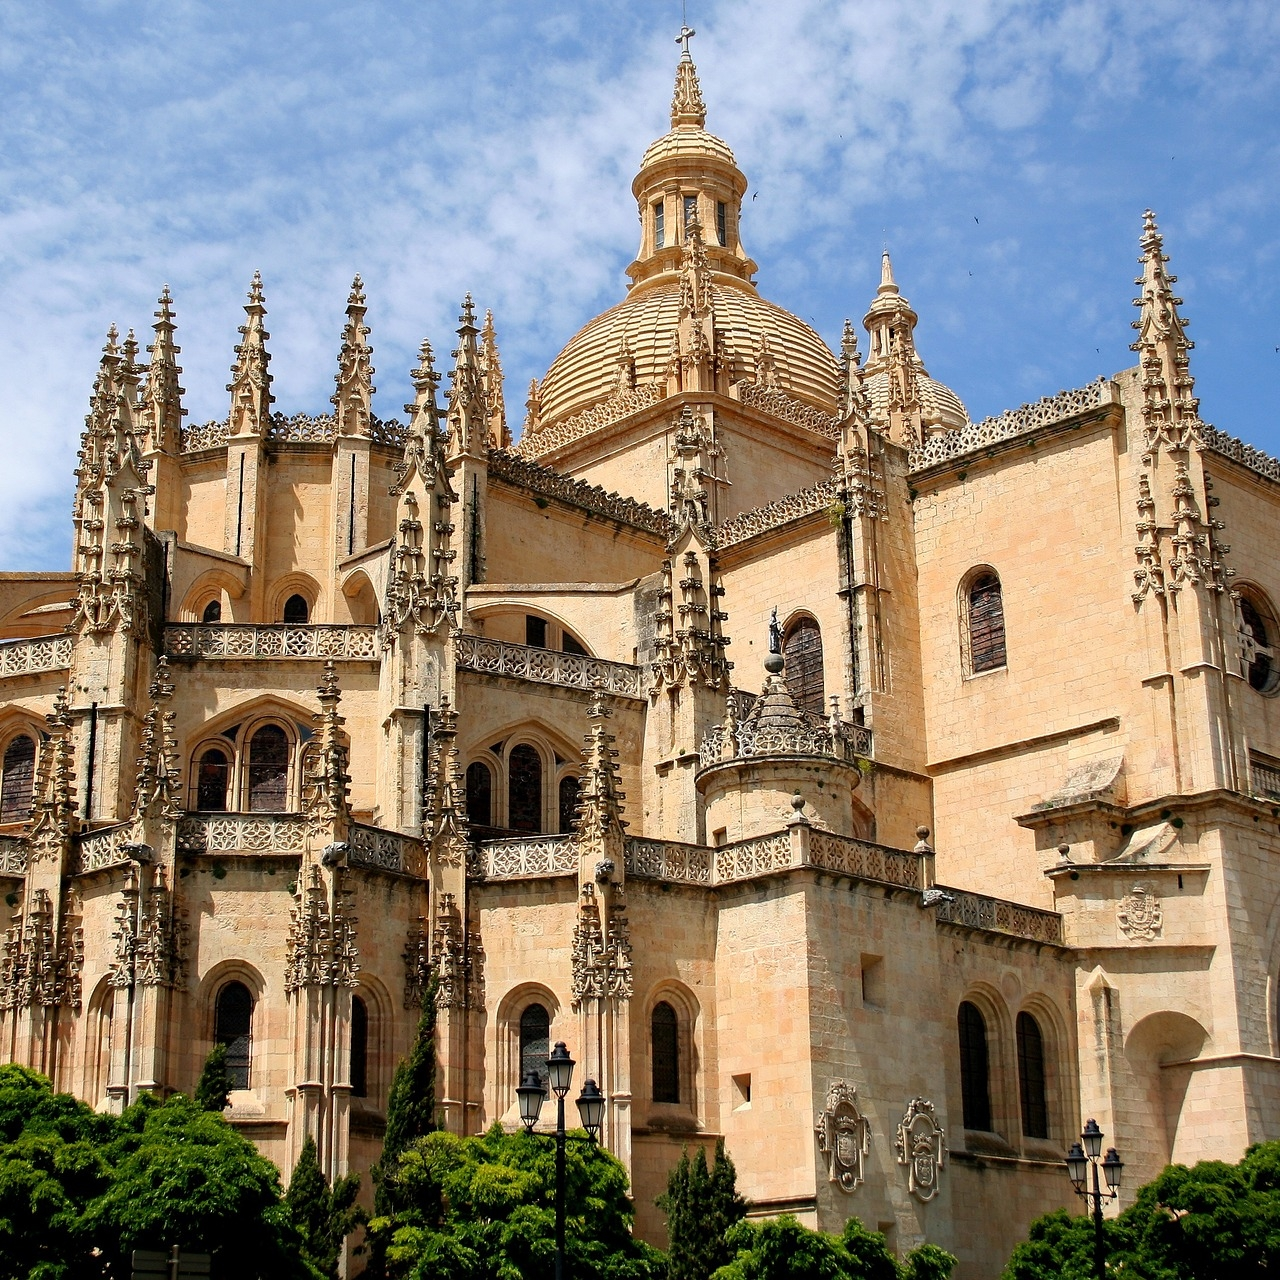 PRESHCO_StudyAbroad_Segovia-Excursion.jpg